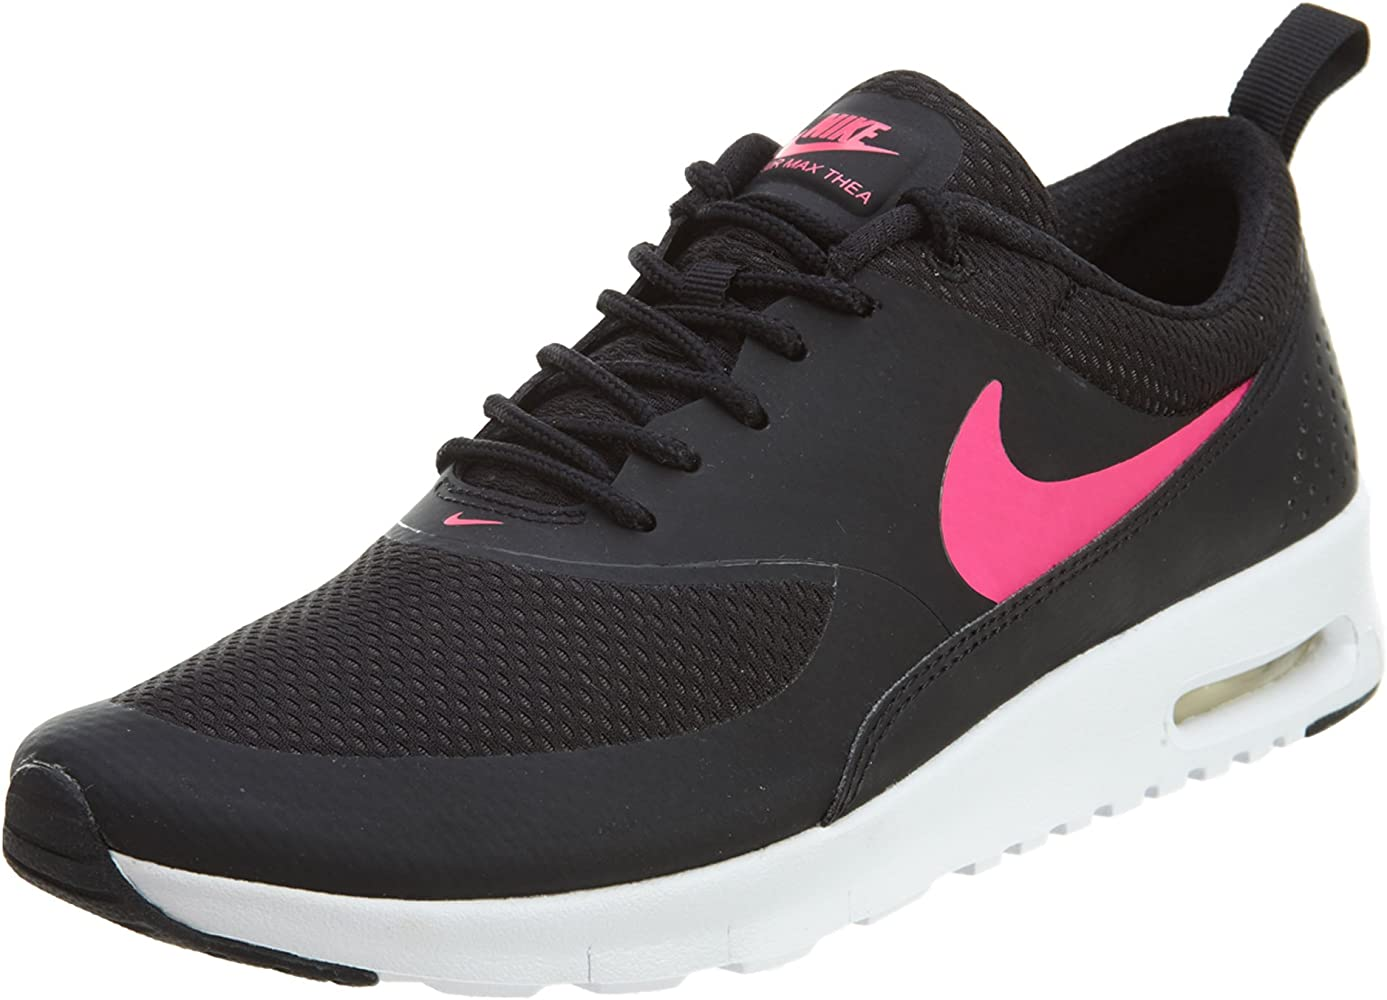 Amazon.com: Nike Air Max Thea Big Kids